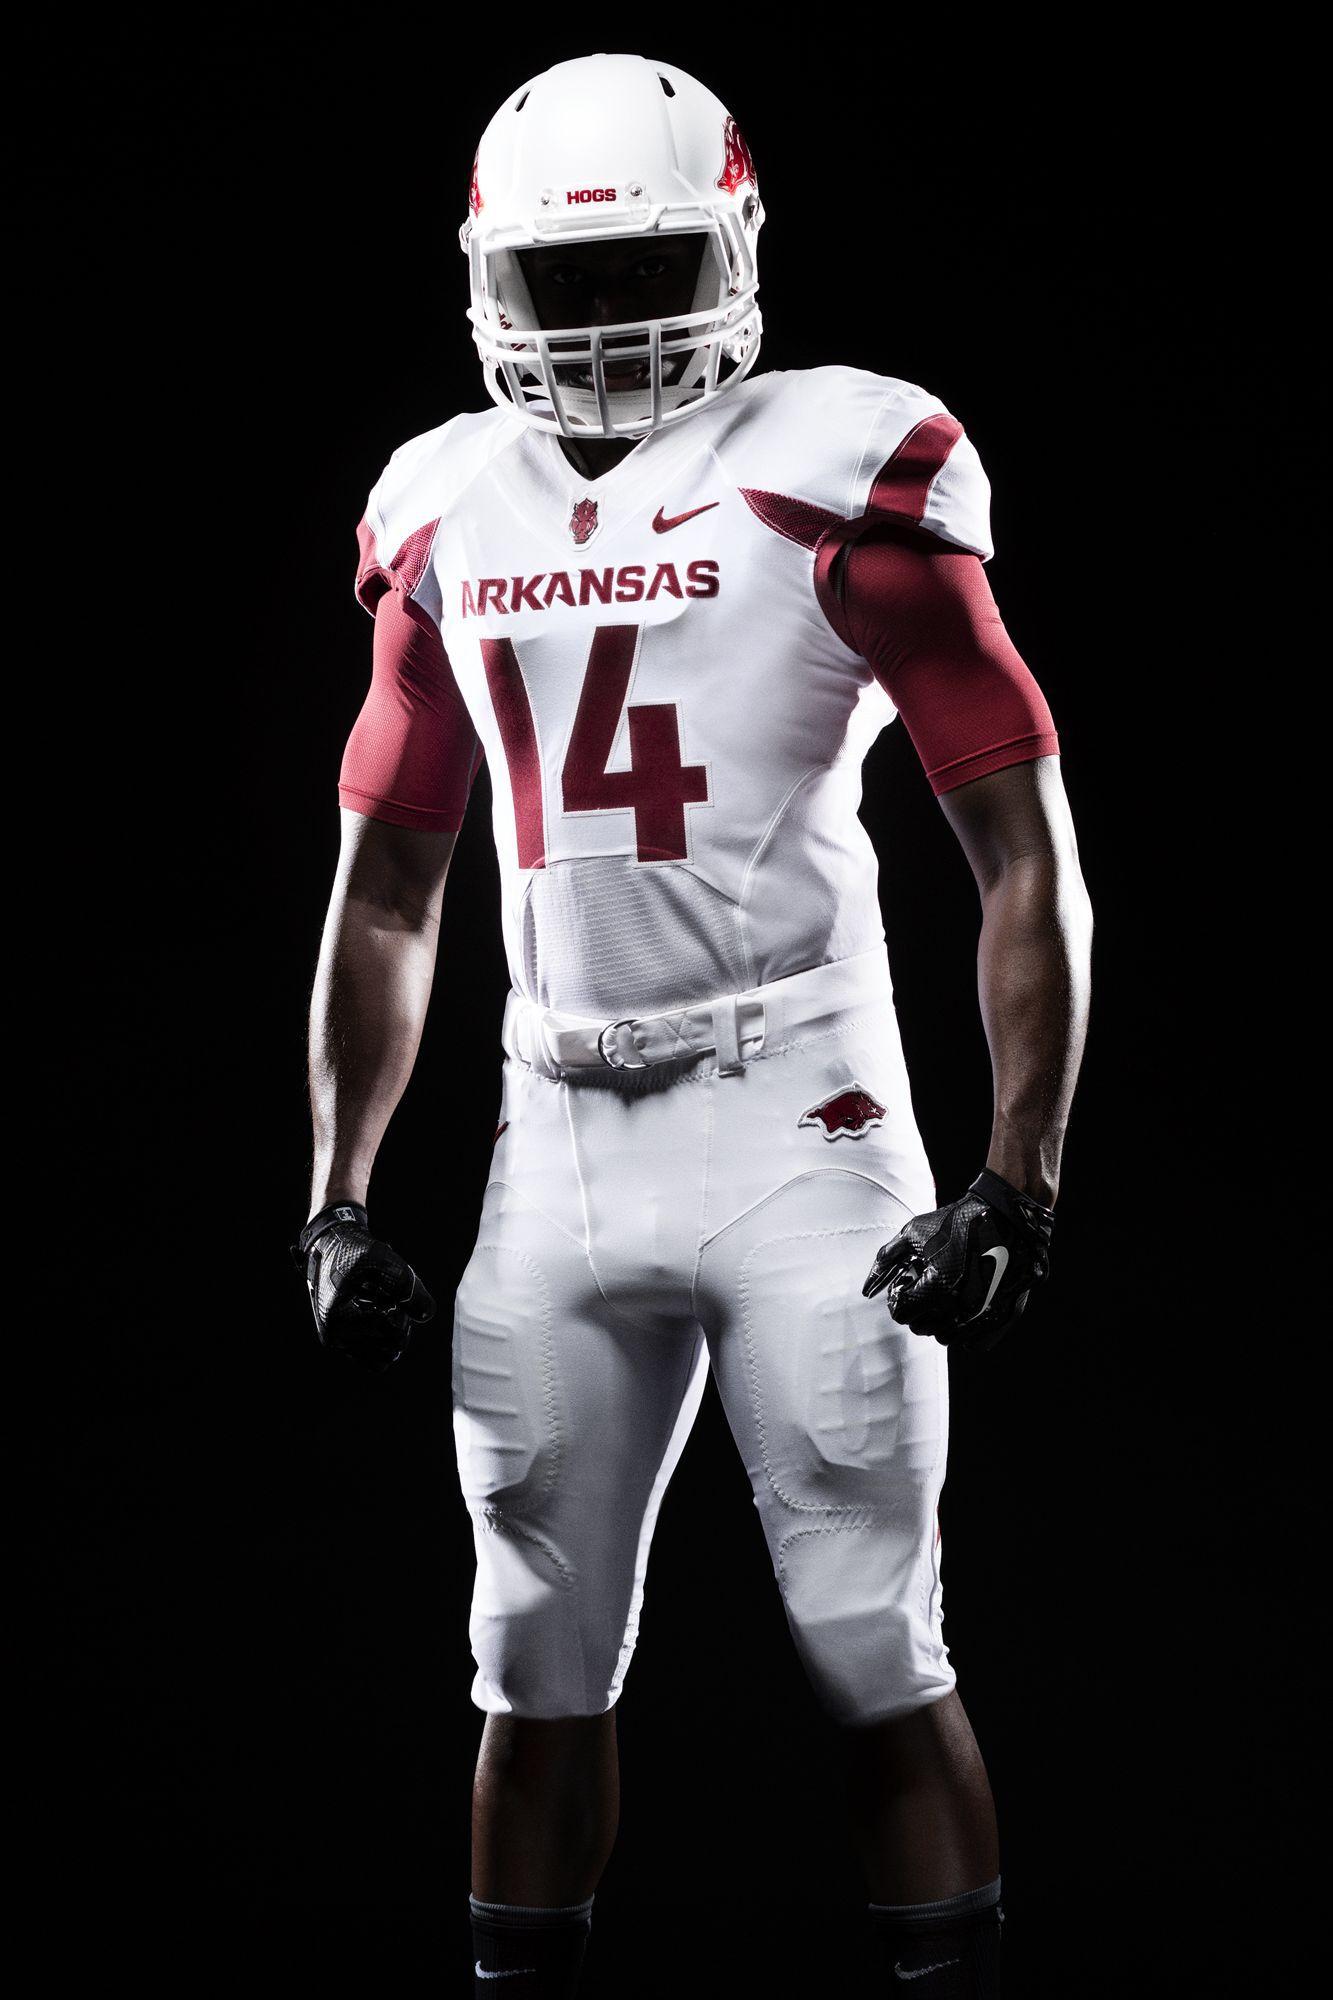 Arkansas Razorbacks Uniform White Arkansas Football Football Uniforms College Football Uniforms